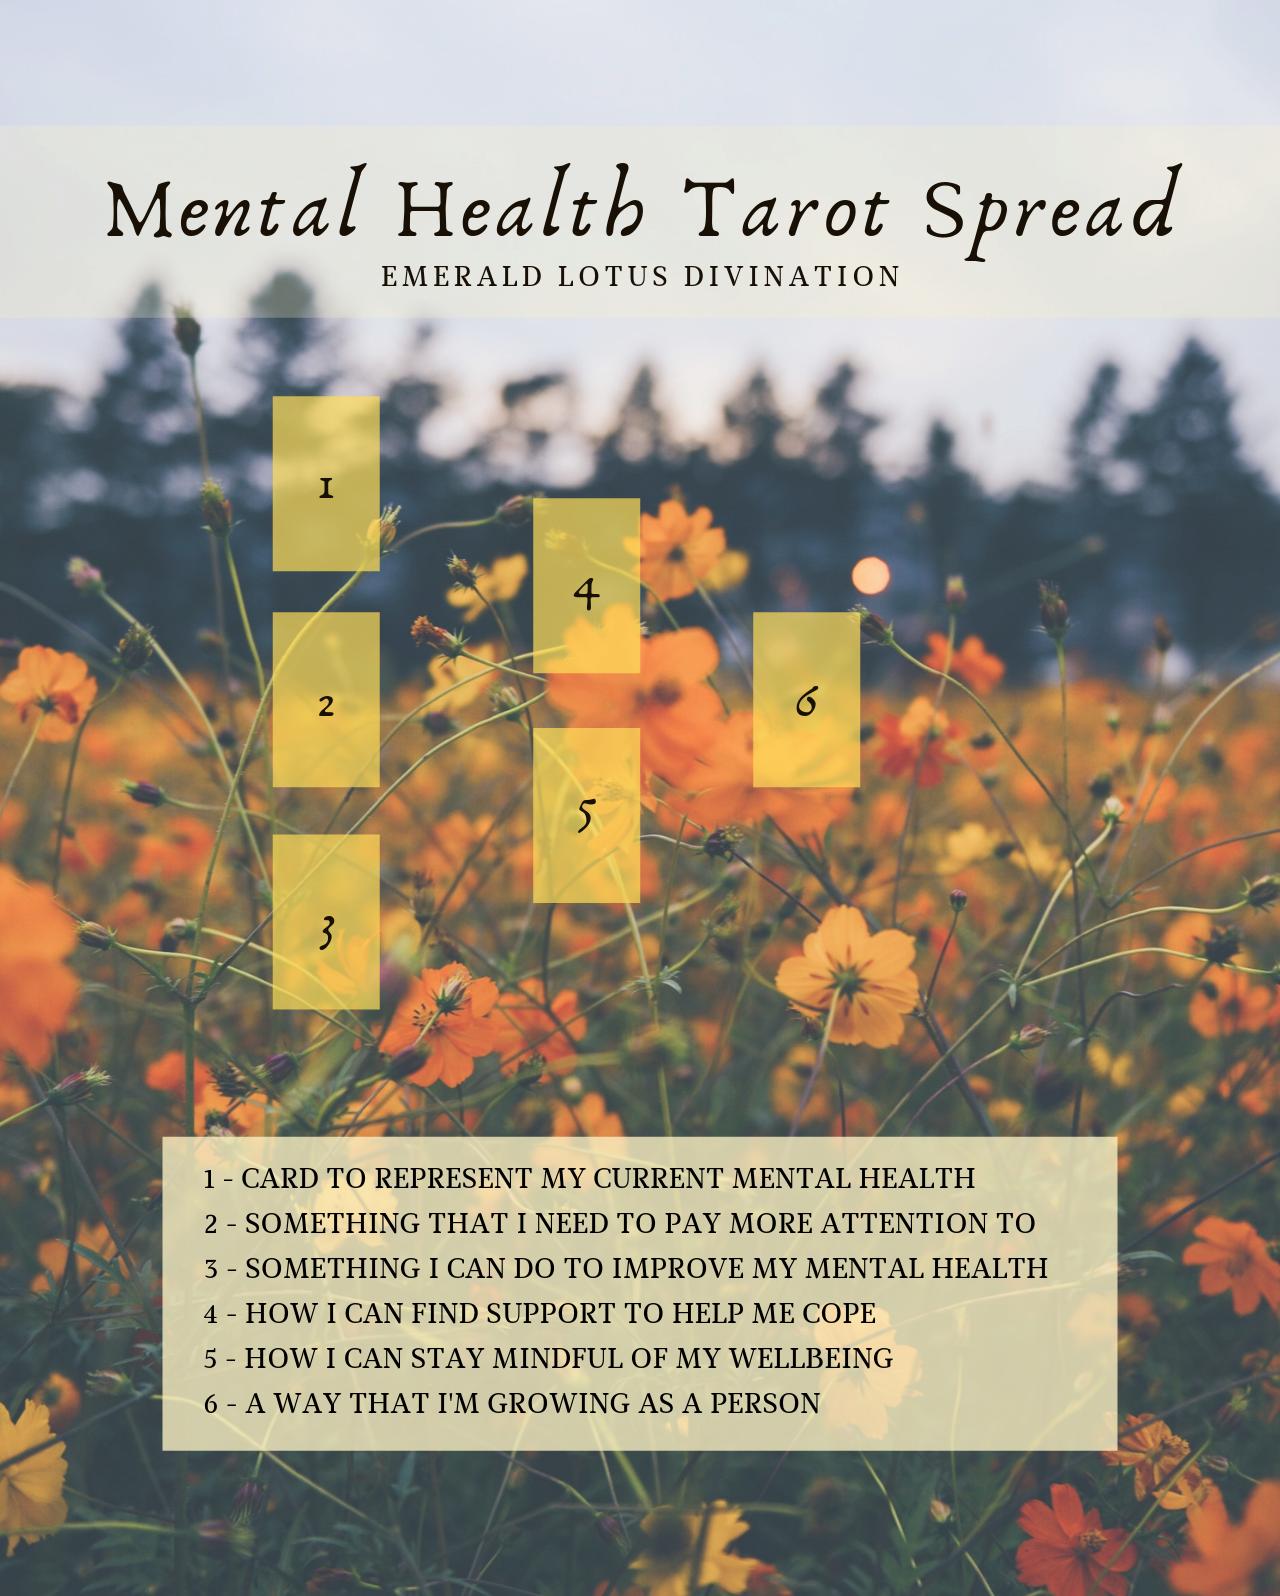 rsz_1mental_health_tarot_spread_-_emerald_lotus_divination.png